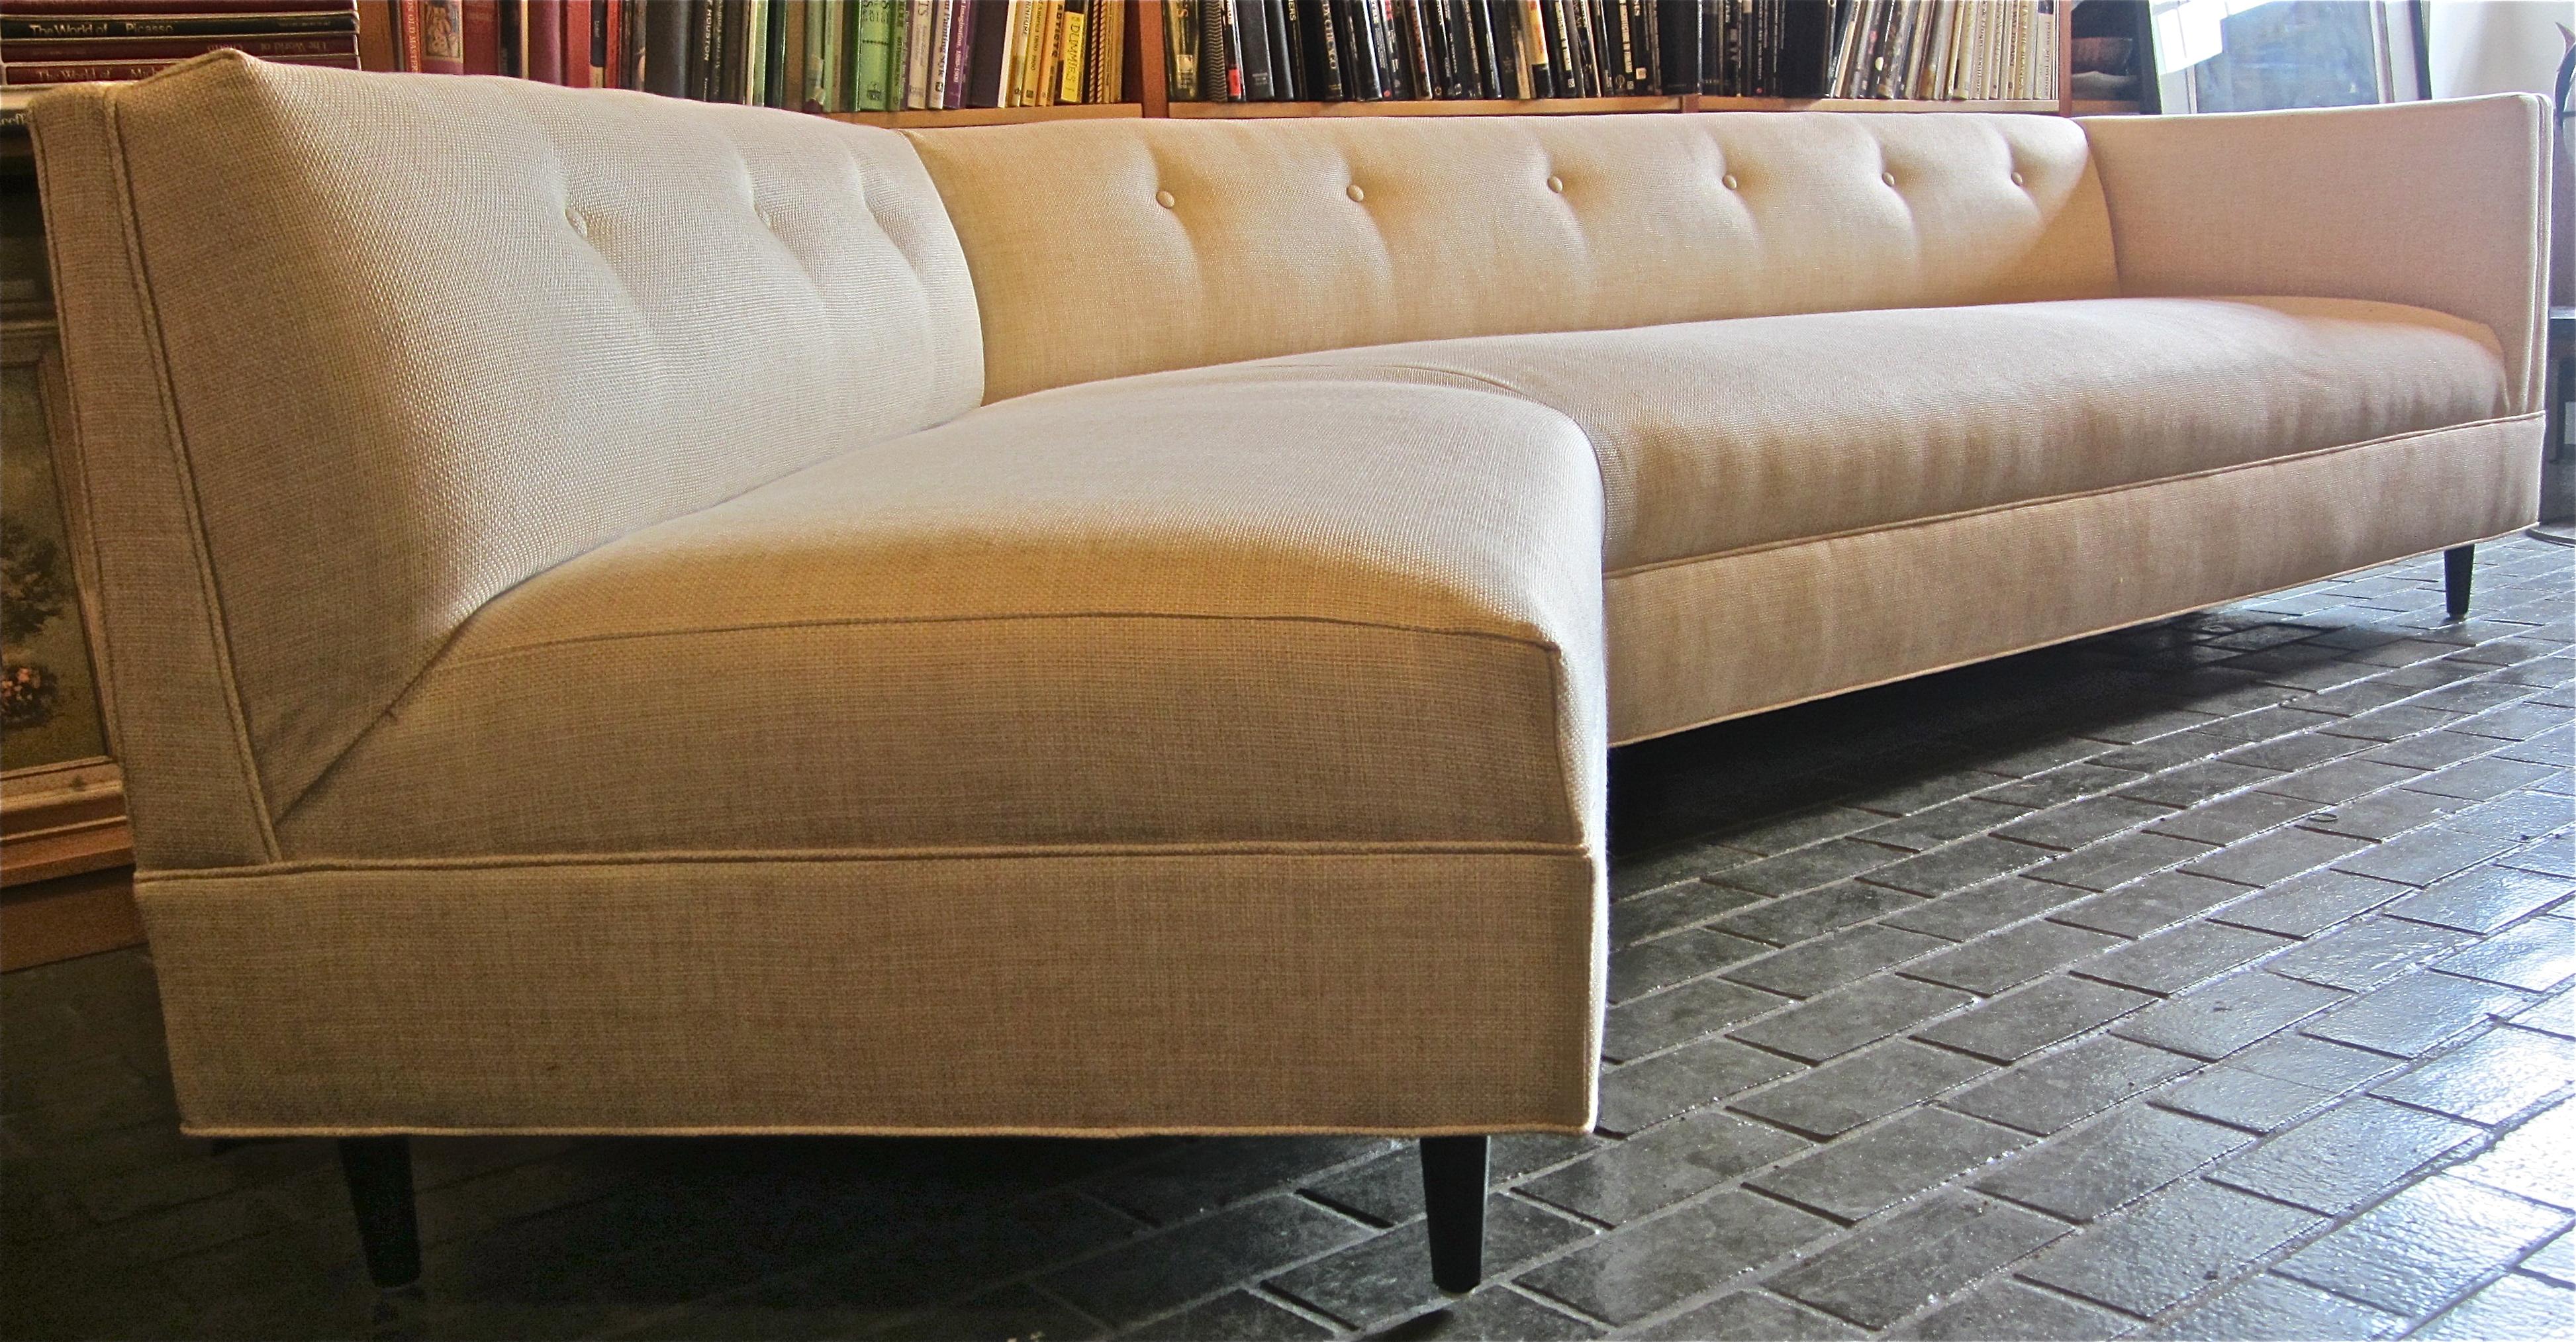 Grand mid century modern sofa mid century modern for Mid century modern furniture houston